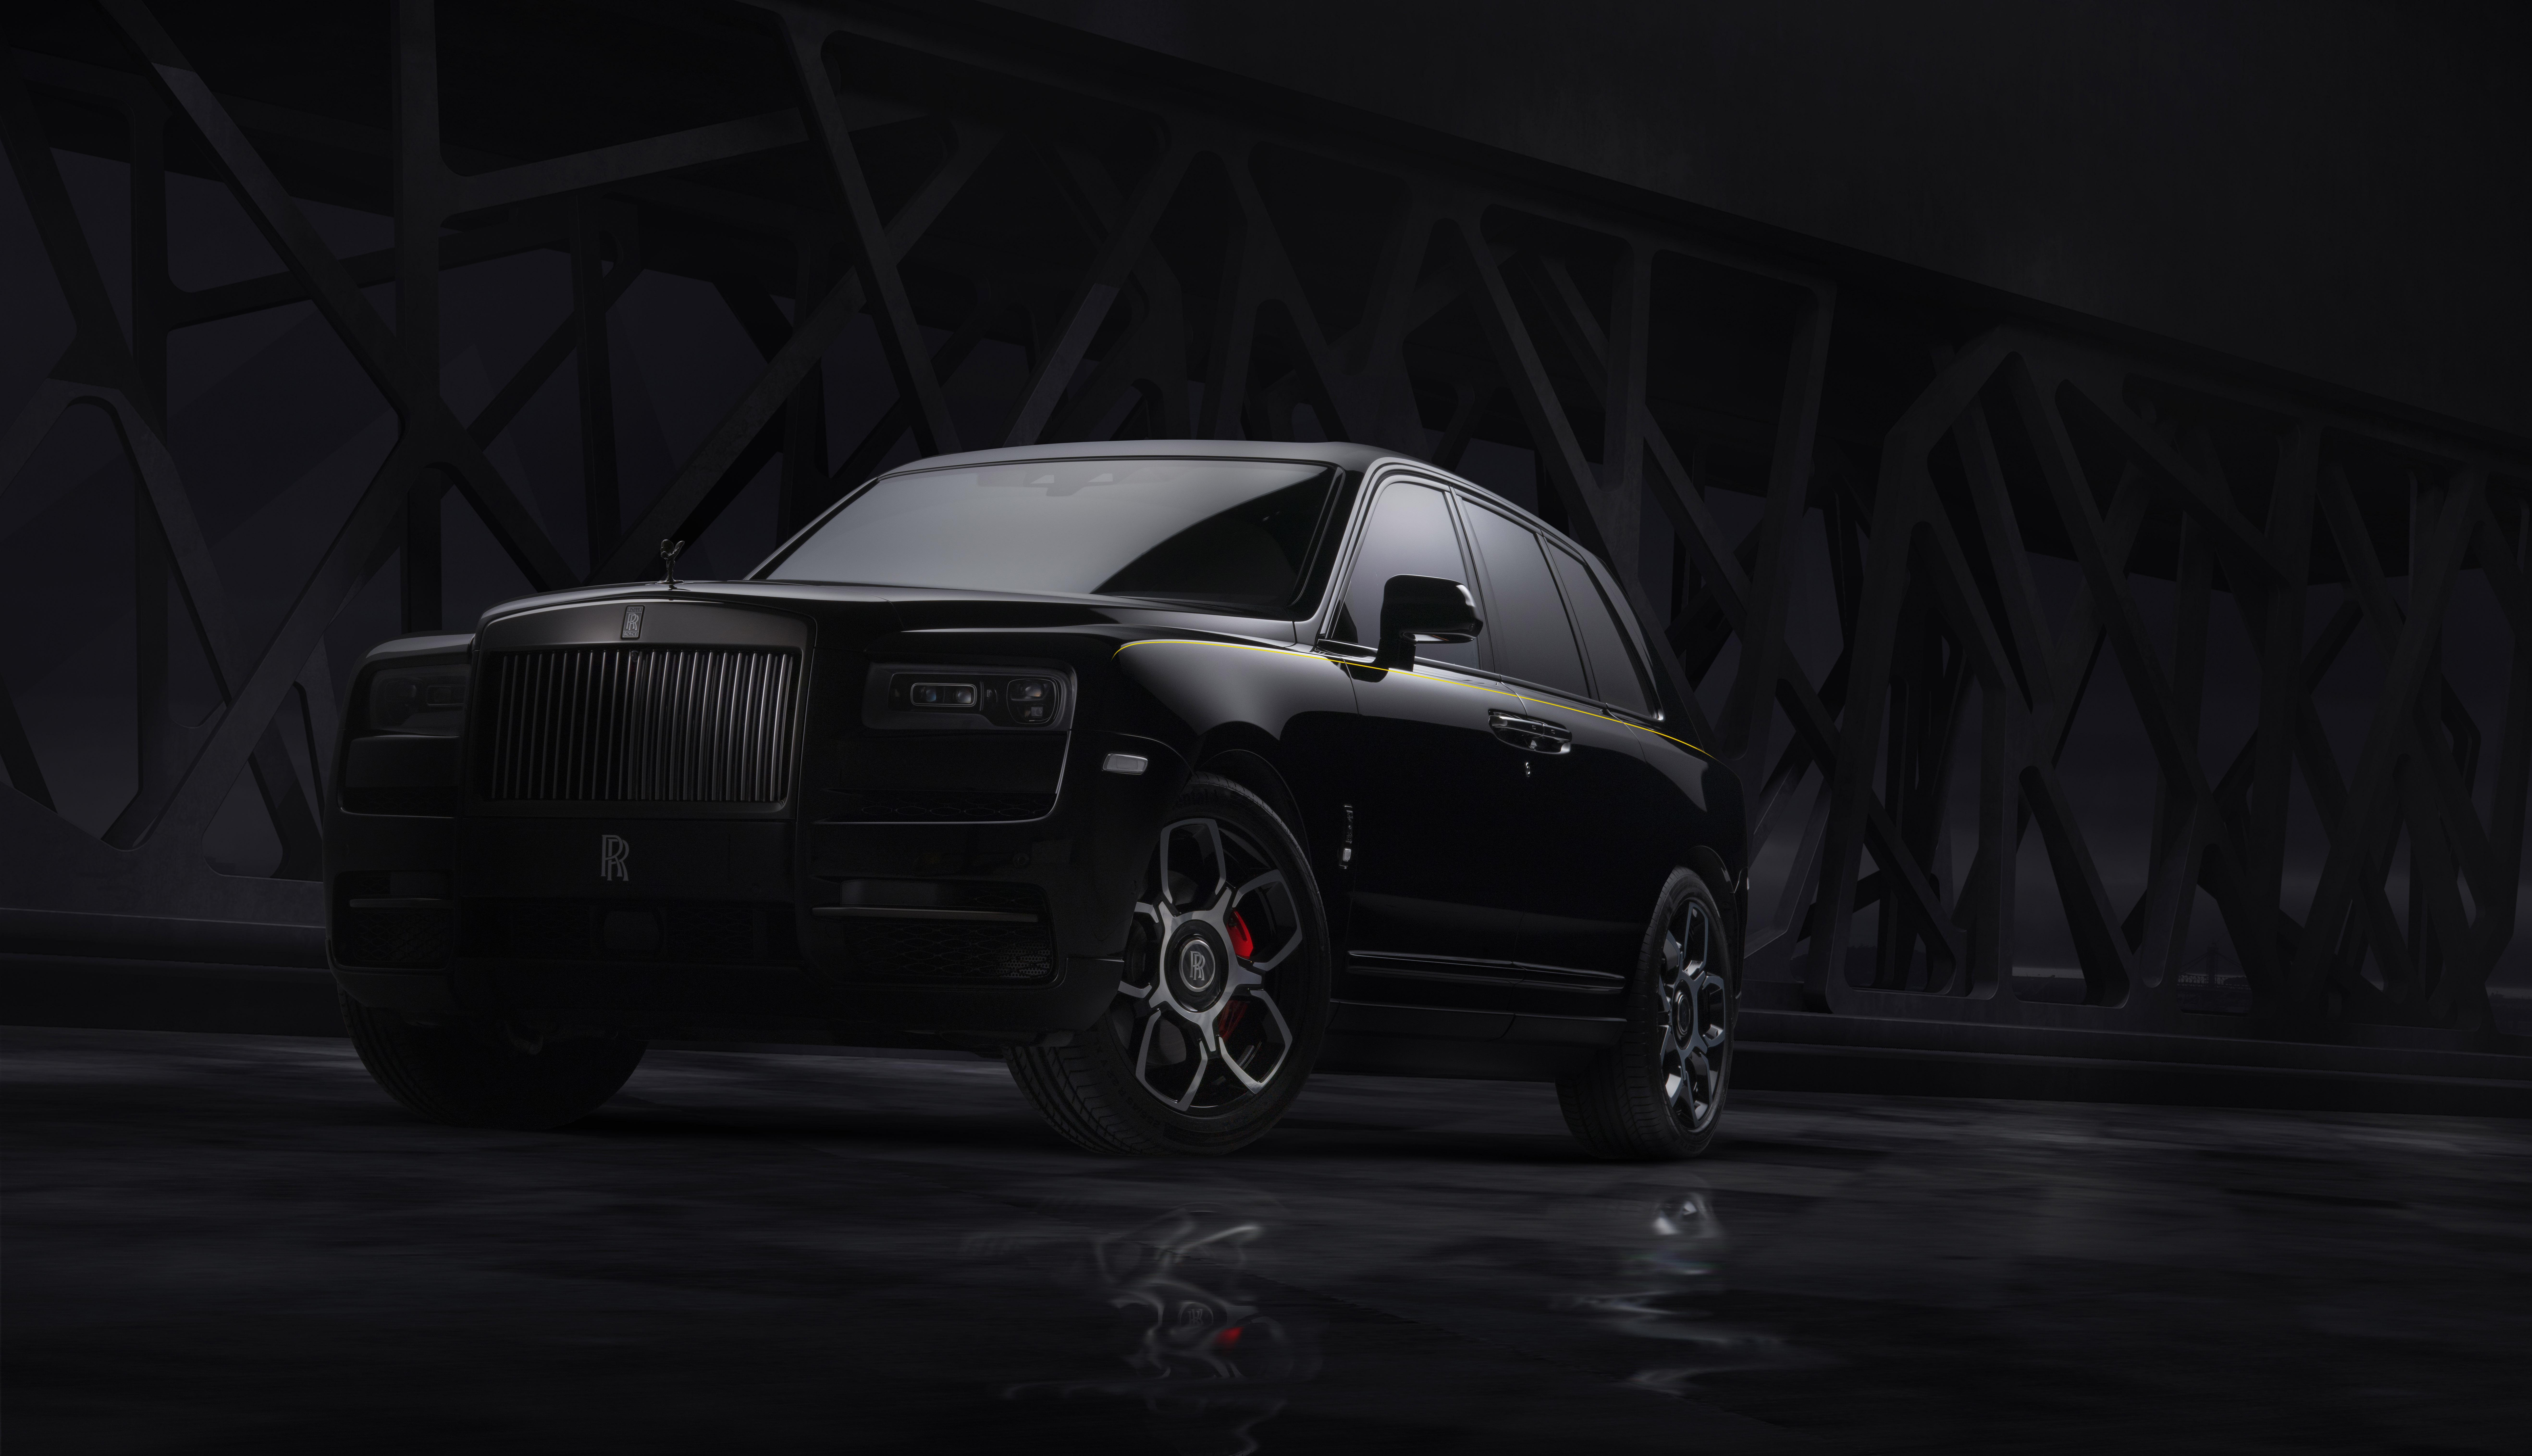 Rolls-Royce Cullinan Black Badge